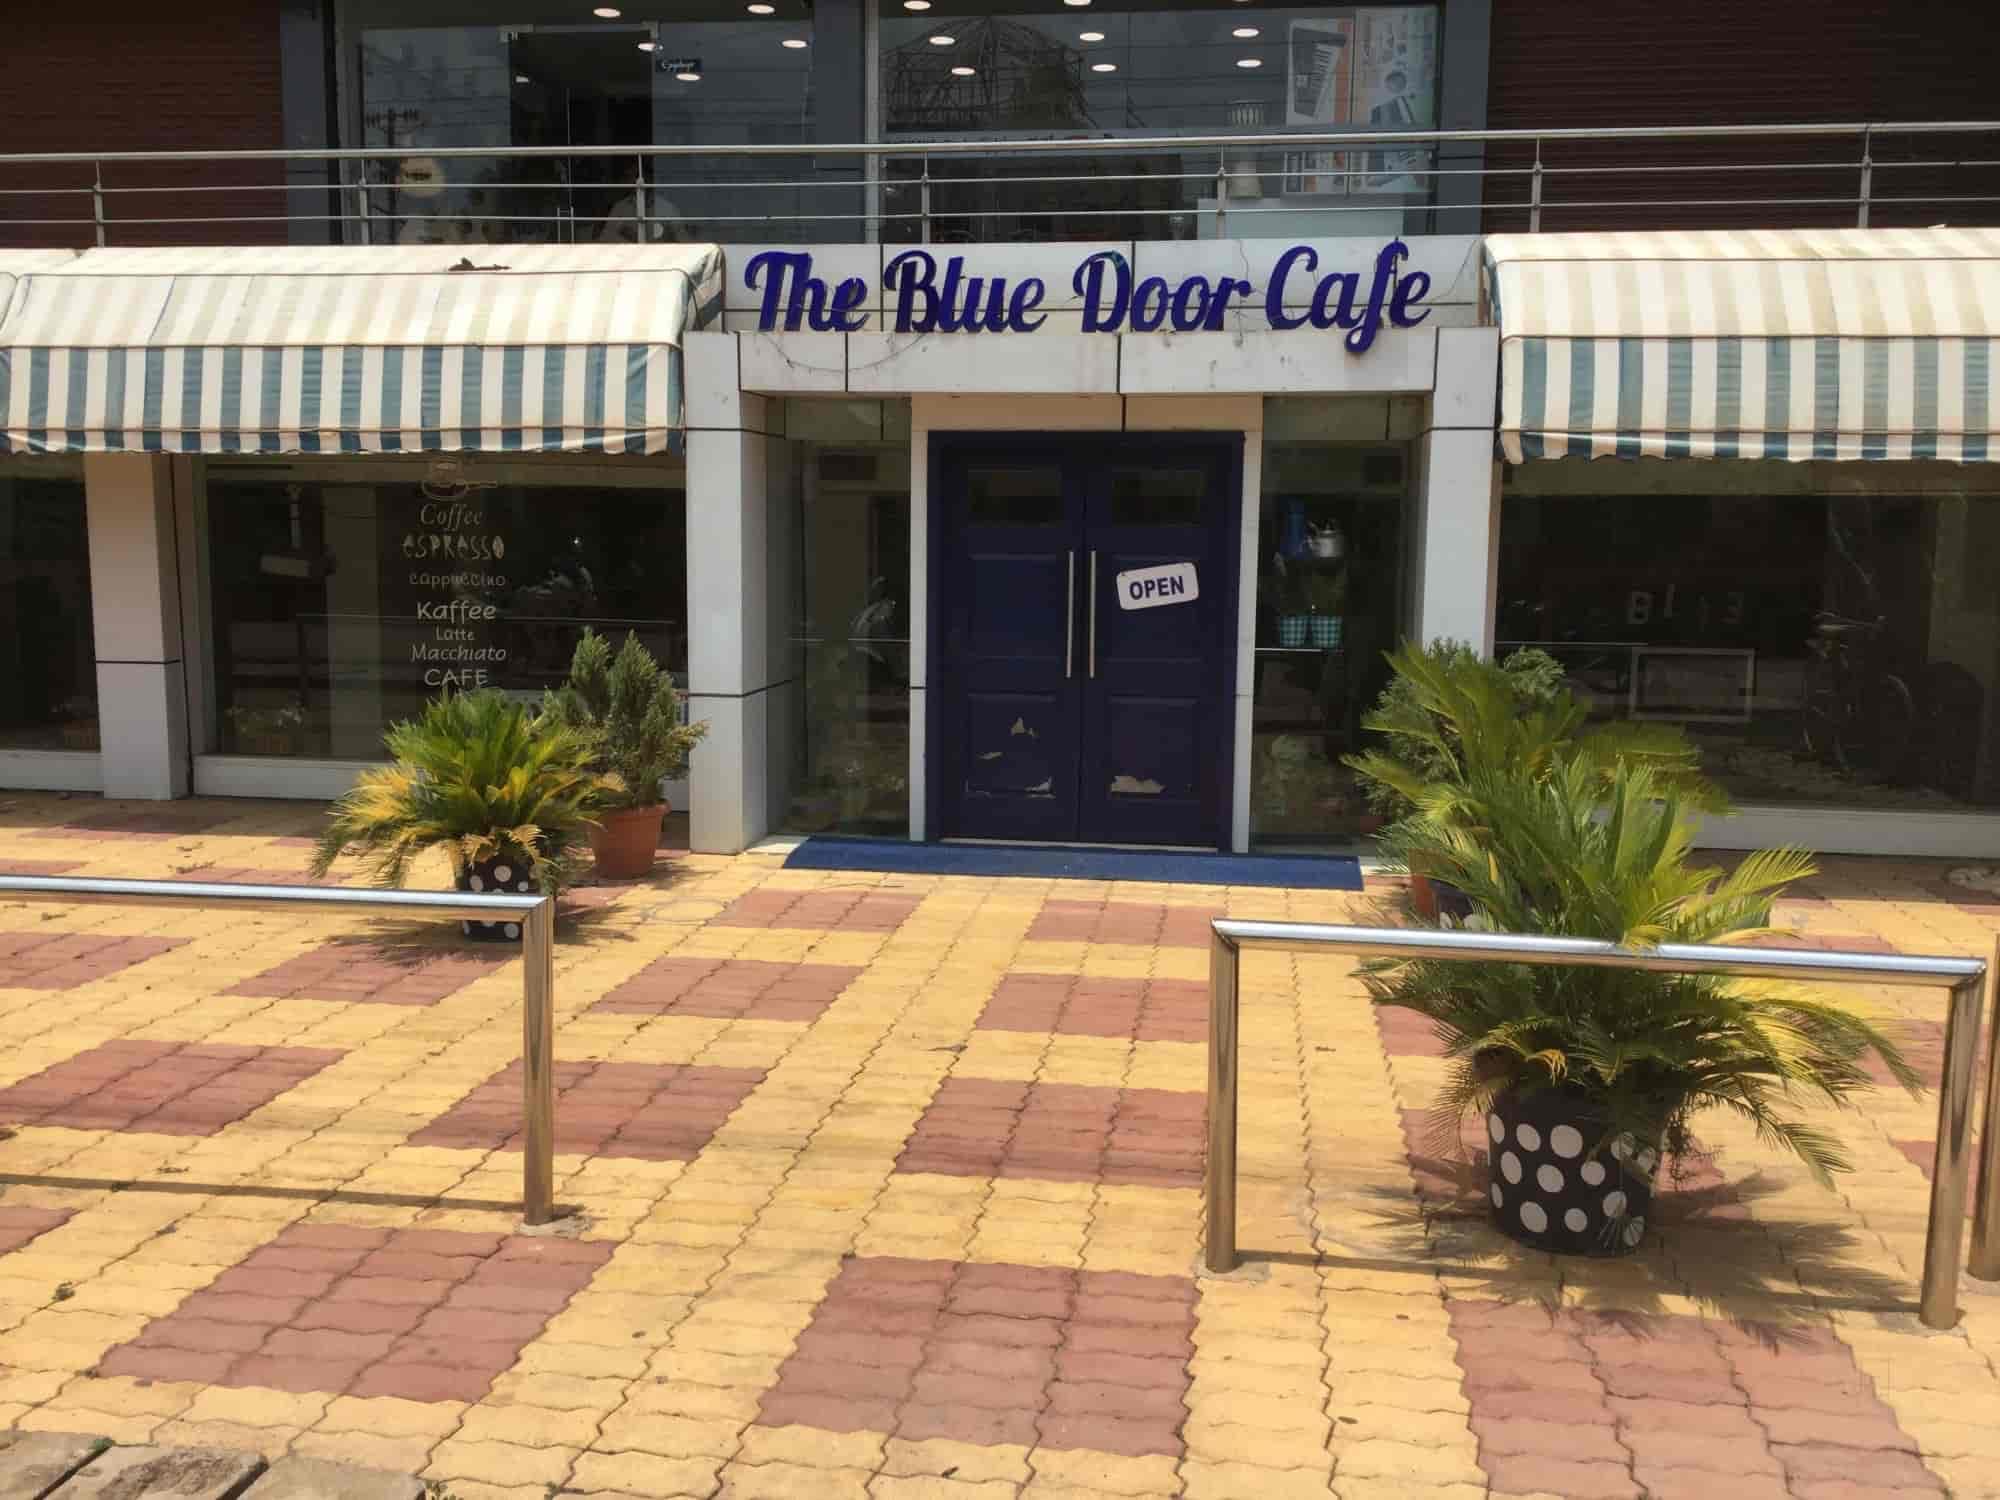 Blue Door Cafe & Blue Door Cafe Nehru Nagar West Durg - Coffee Shops - Justdial